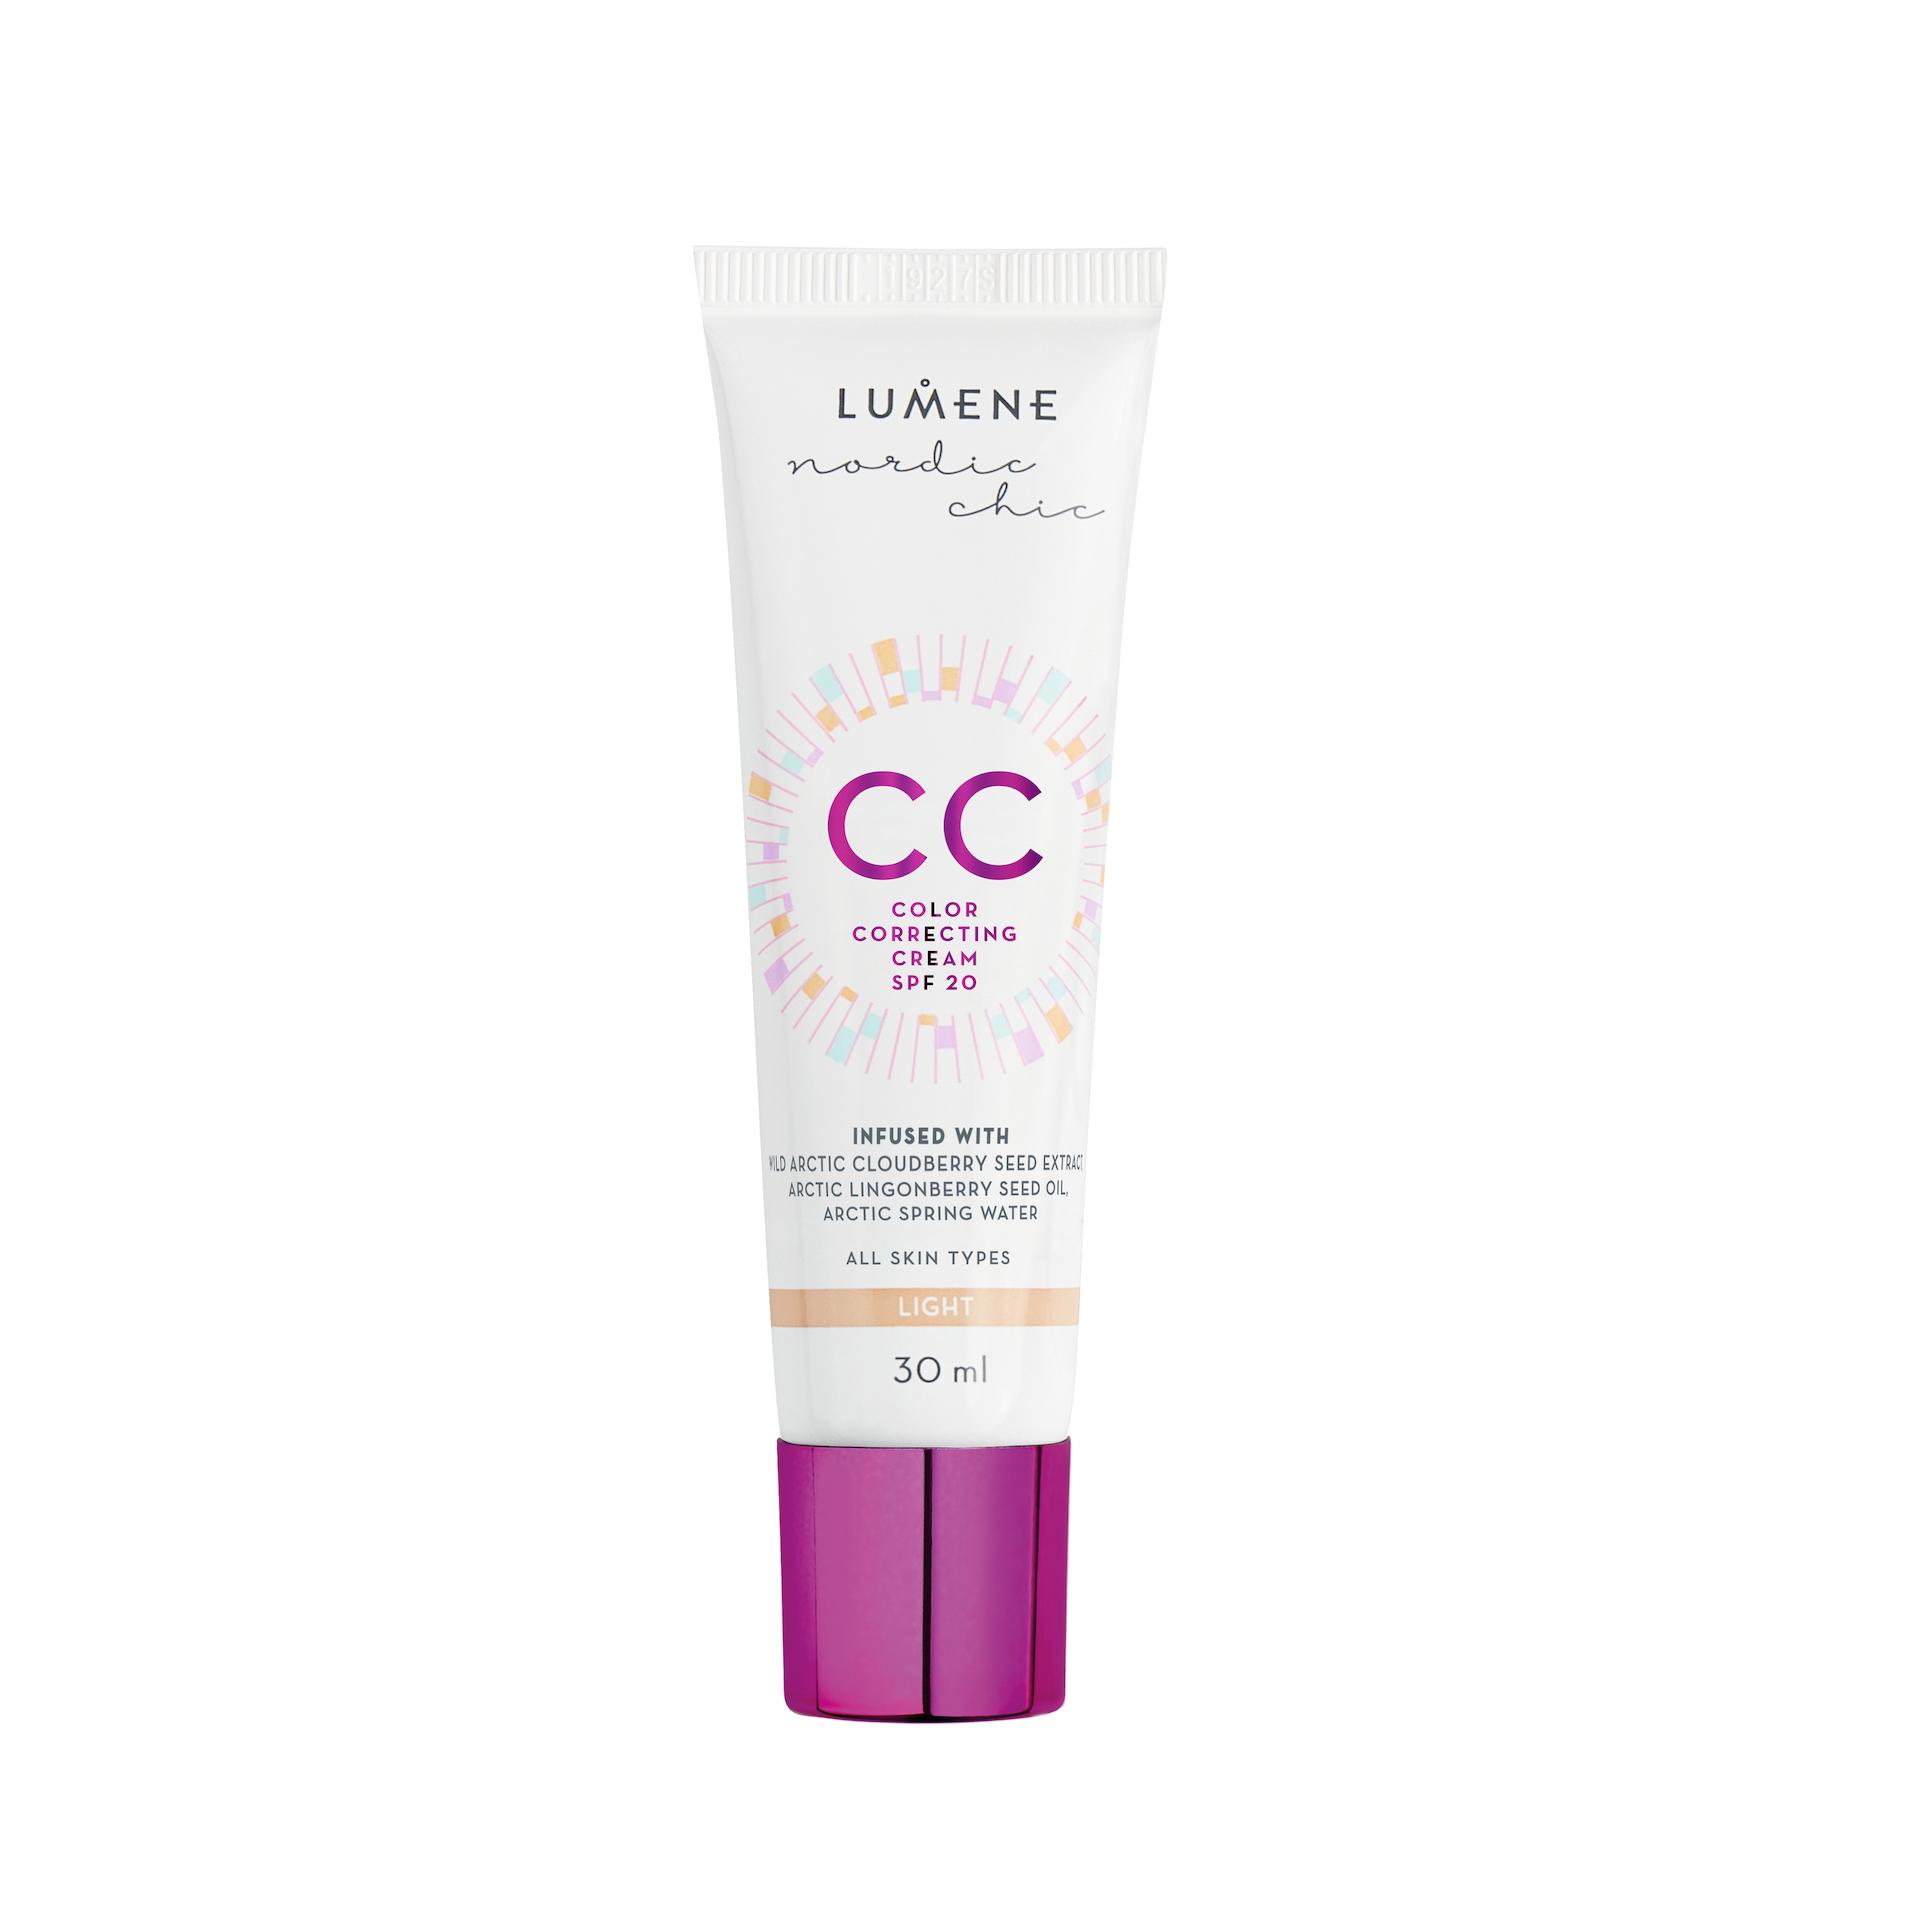 Nordic Chic CC Color Correcting Cream